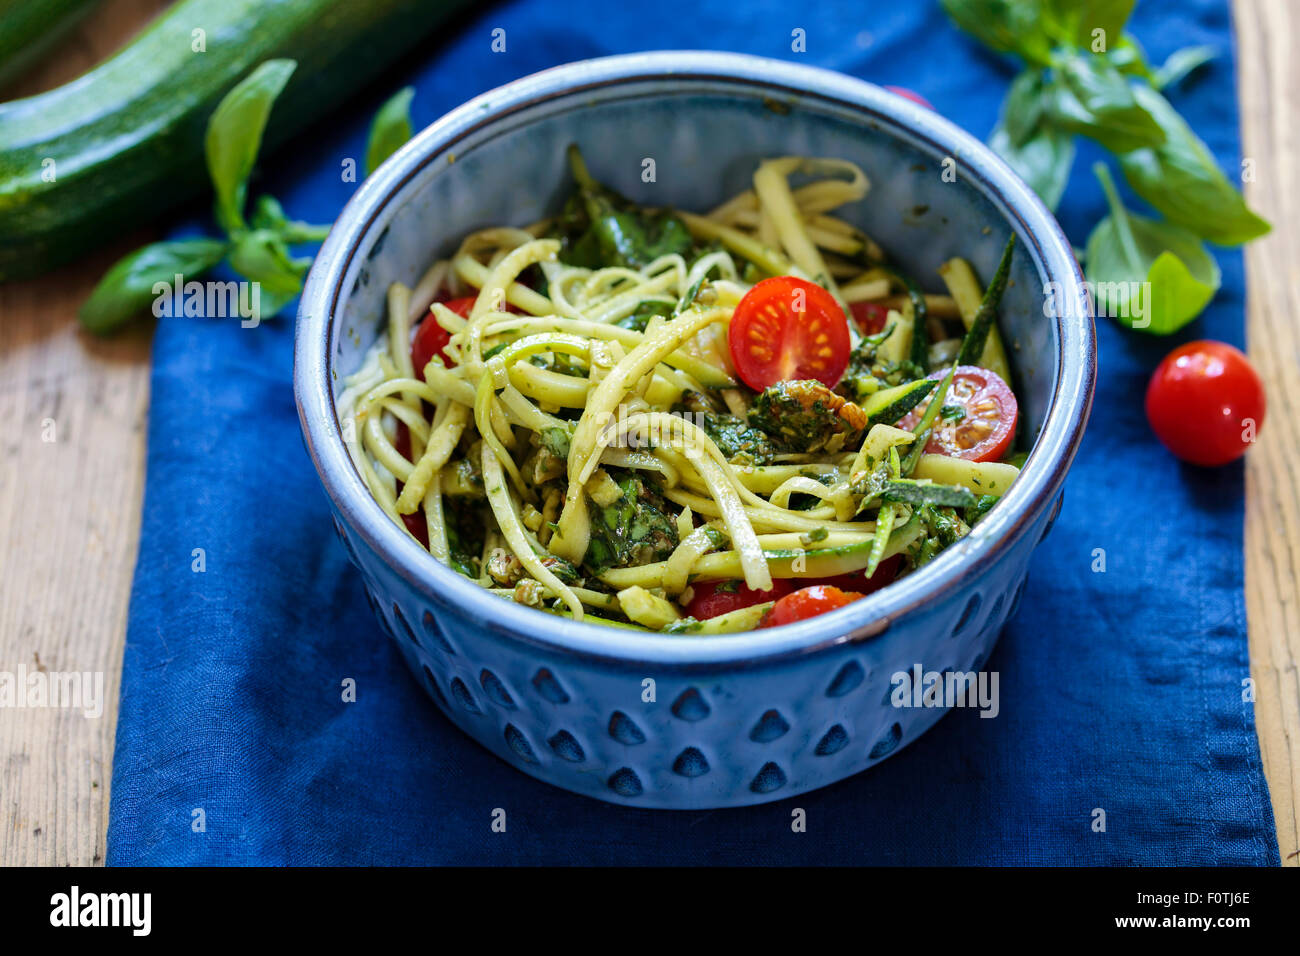 Zucchini spaghetti with cherry tomatoes and basil pesto - Stock Image